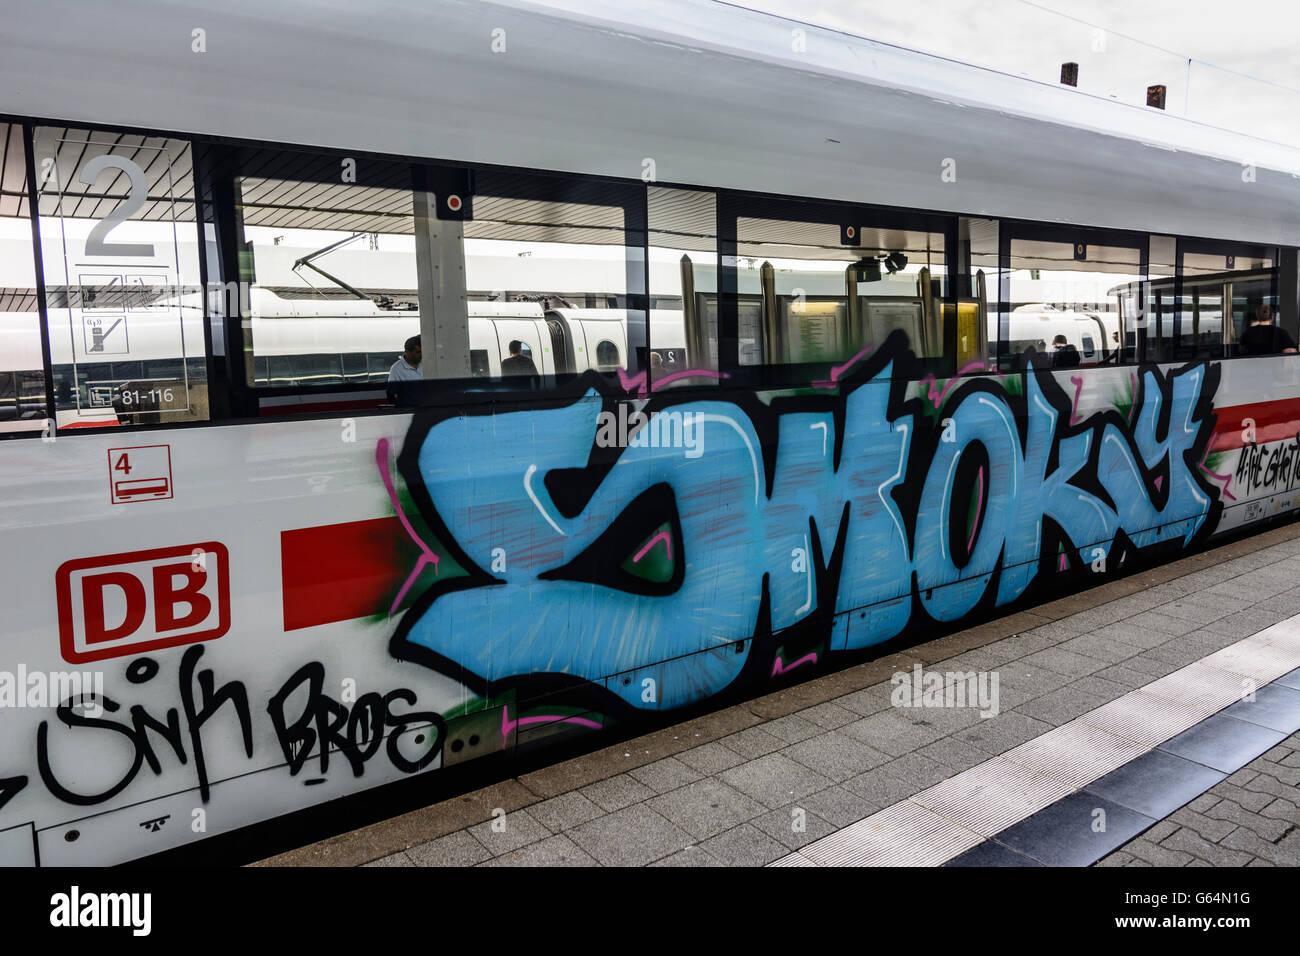 mit Graffiti beschmiert, ICE Deutsche Bahn (DB AG), Mannheim, Deutschland, Baden-Württemberg, Kurpfalz Stockbild